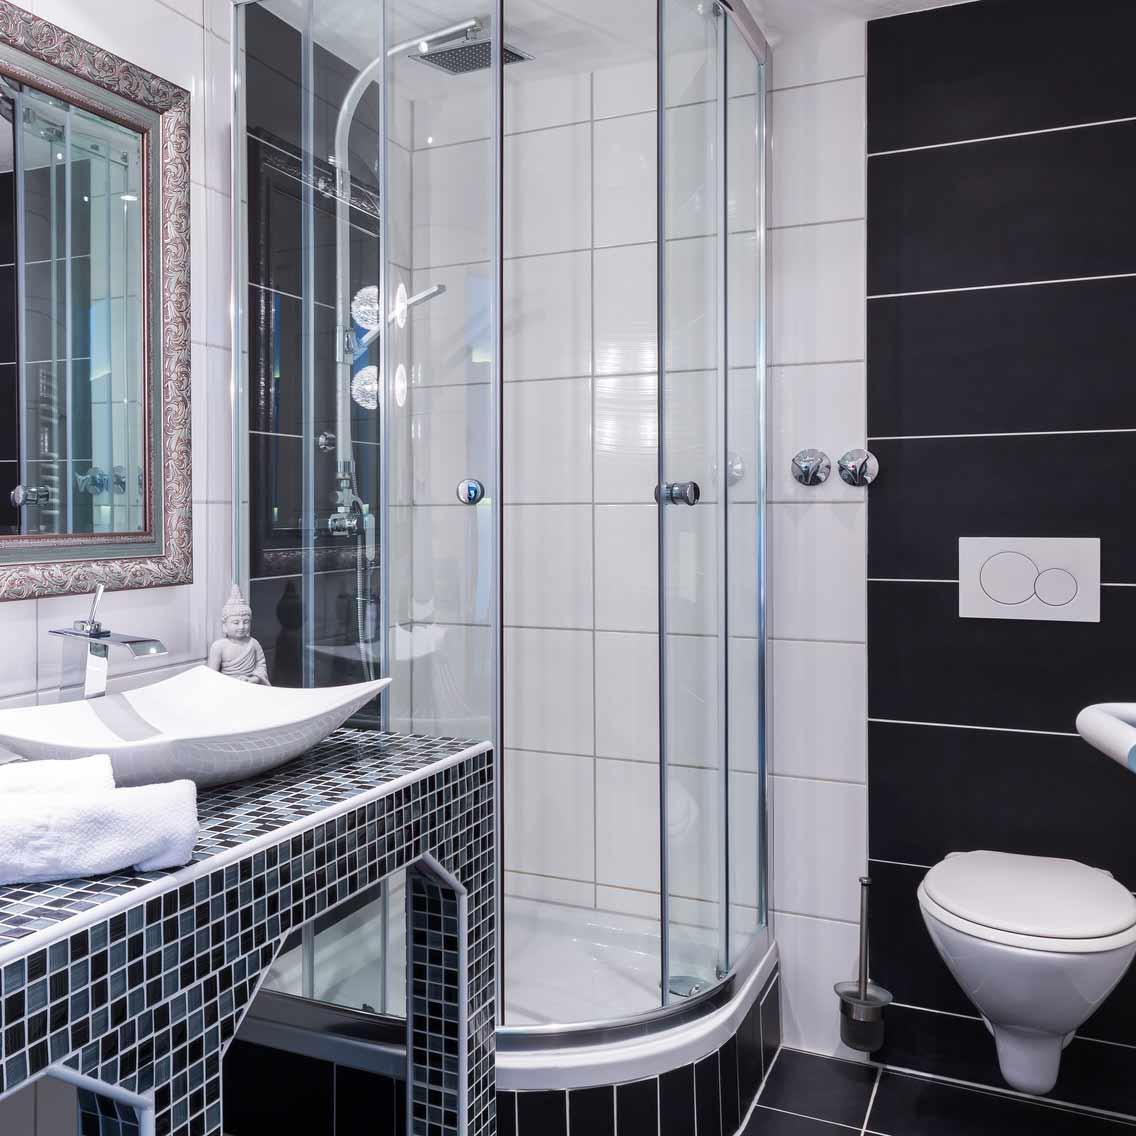 fliesenleger in heidelberg 9 bewertungen bei. Black Bedroom Furniture Sets. Home Design Ideas